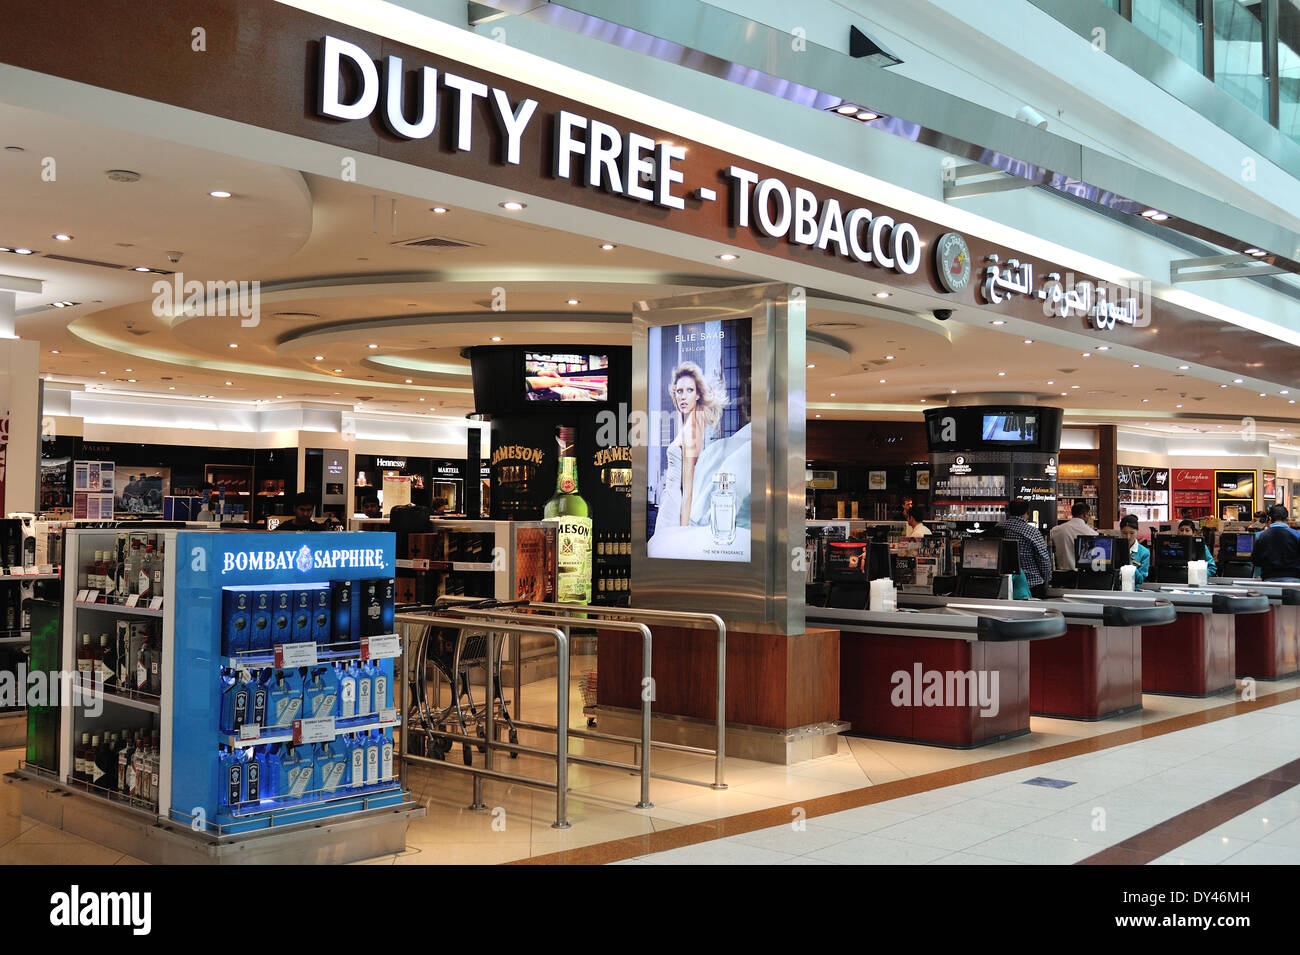 duty free shop dubai airport stock photo 68319905 alamy. Black Bedroom Furniture Sets. Home Design Ideas